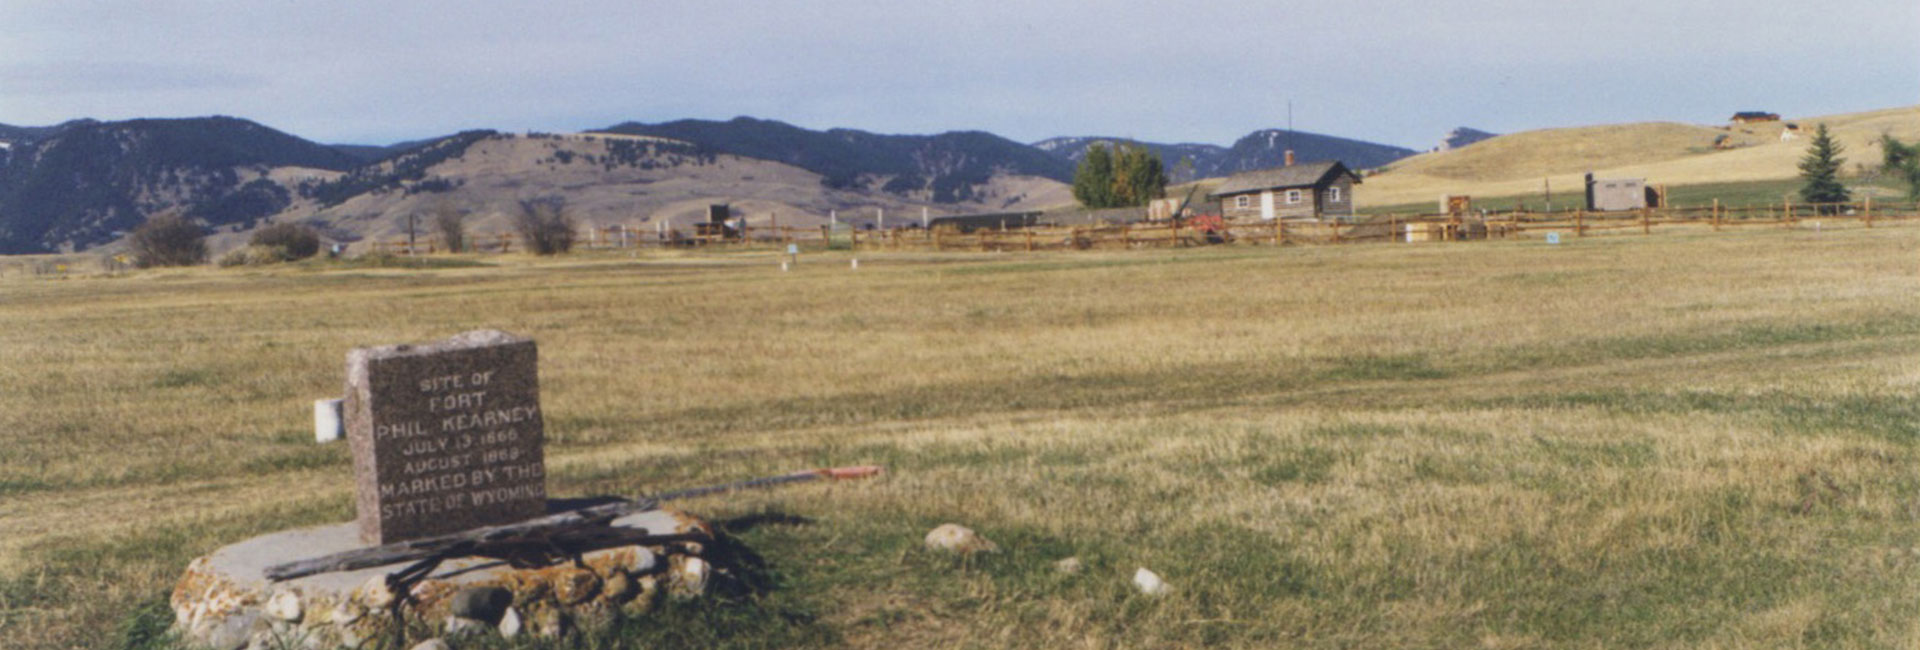 robert-kershaw-battlefield-tours-custer-hero-image